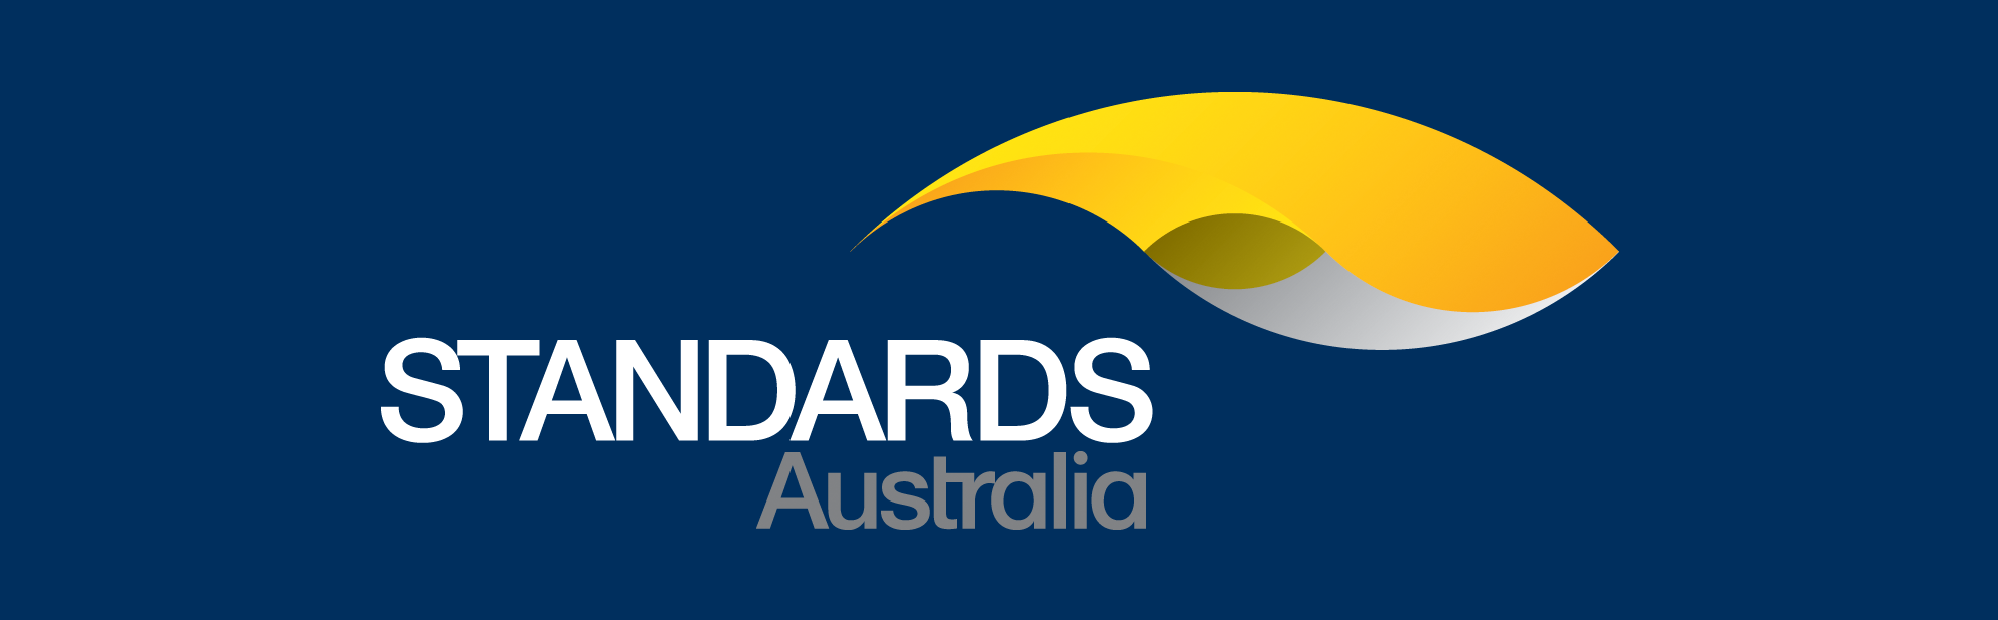 Graduate Job in the Sydney CBD profile banner profile banner